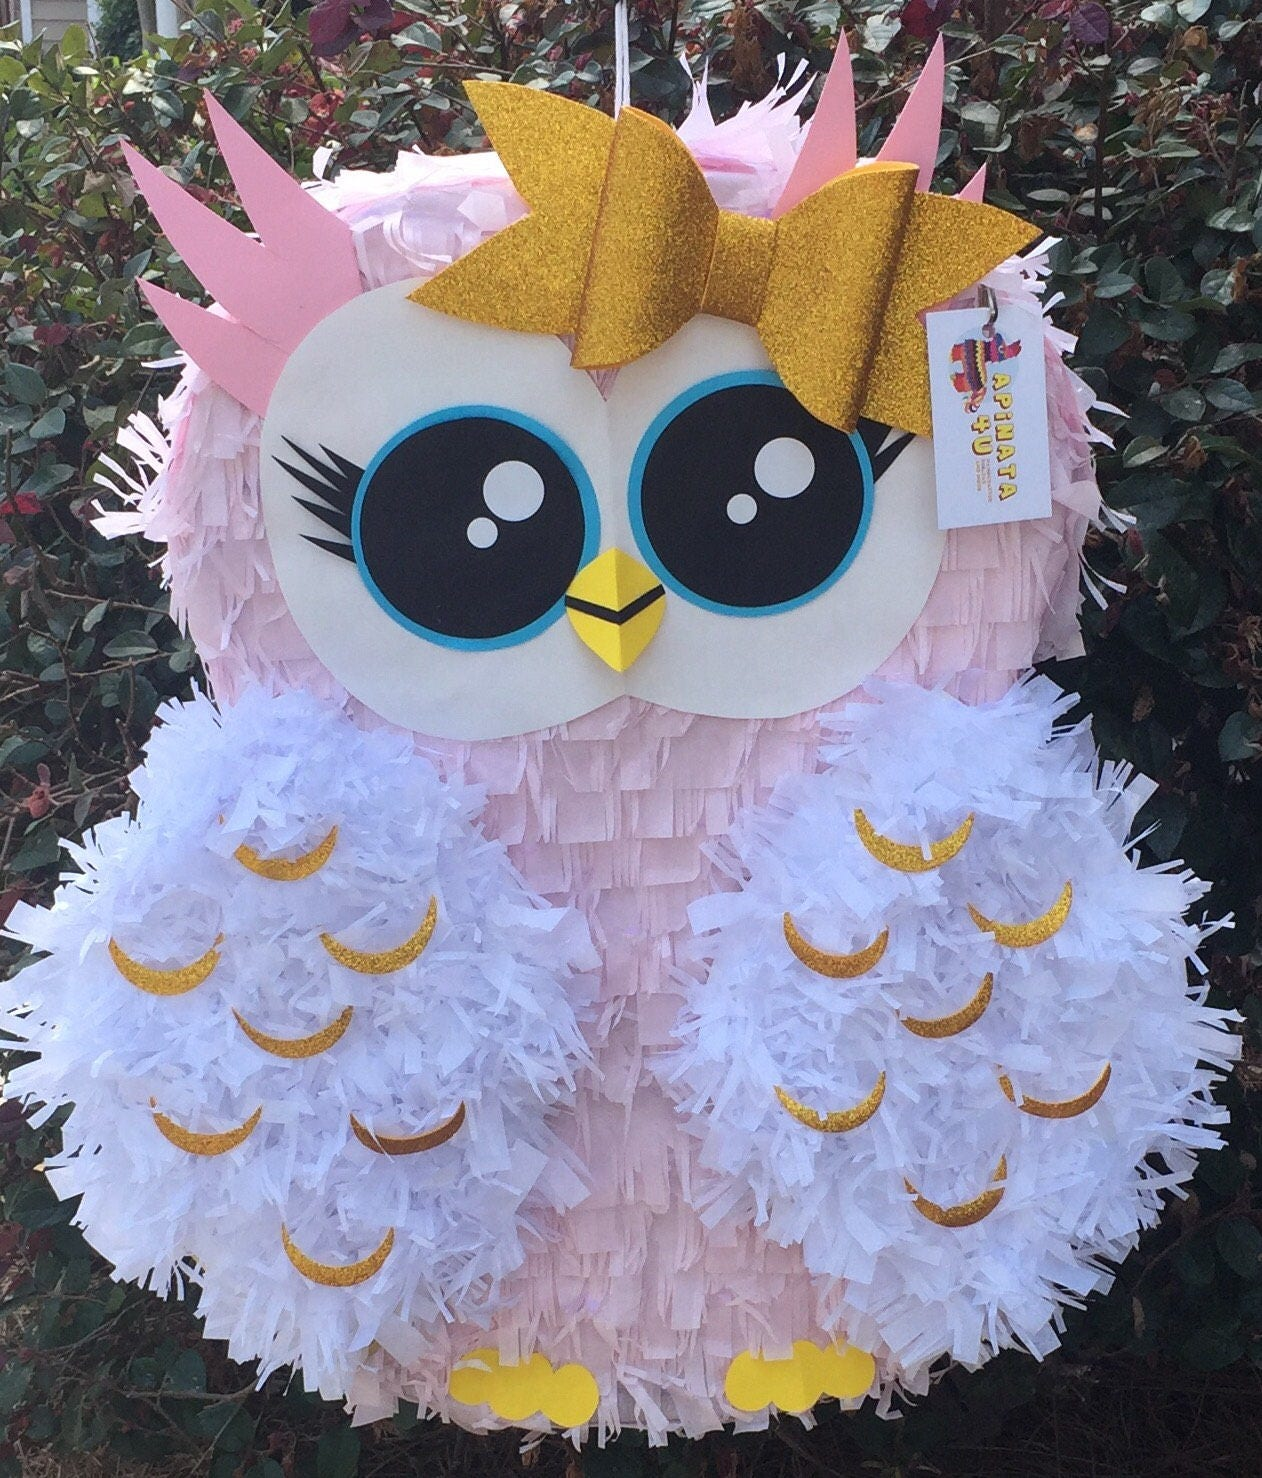 Piñata de buho grande hecha a mano por encargo | Etsy